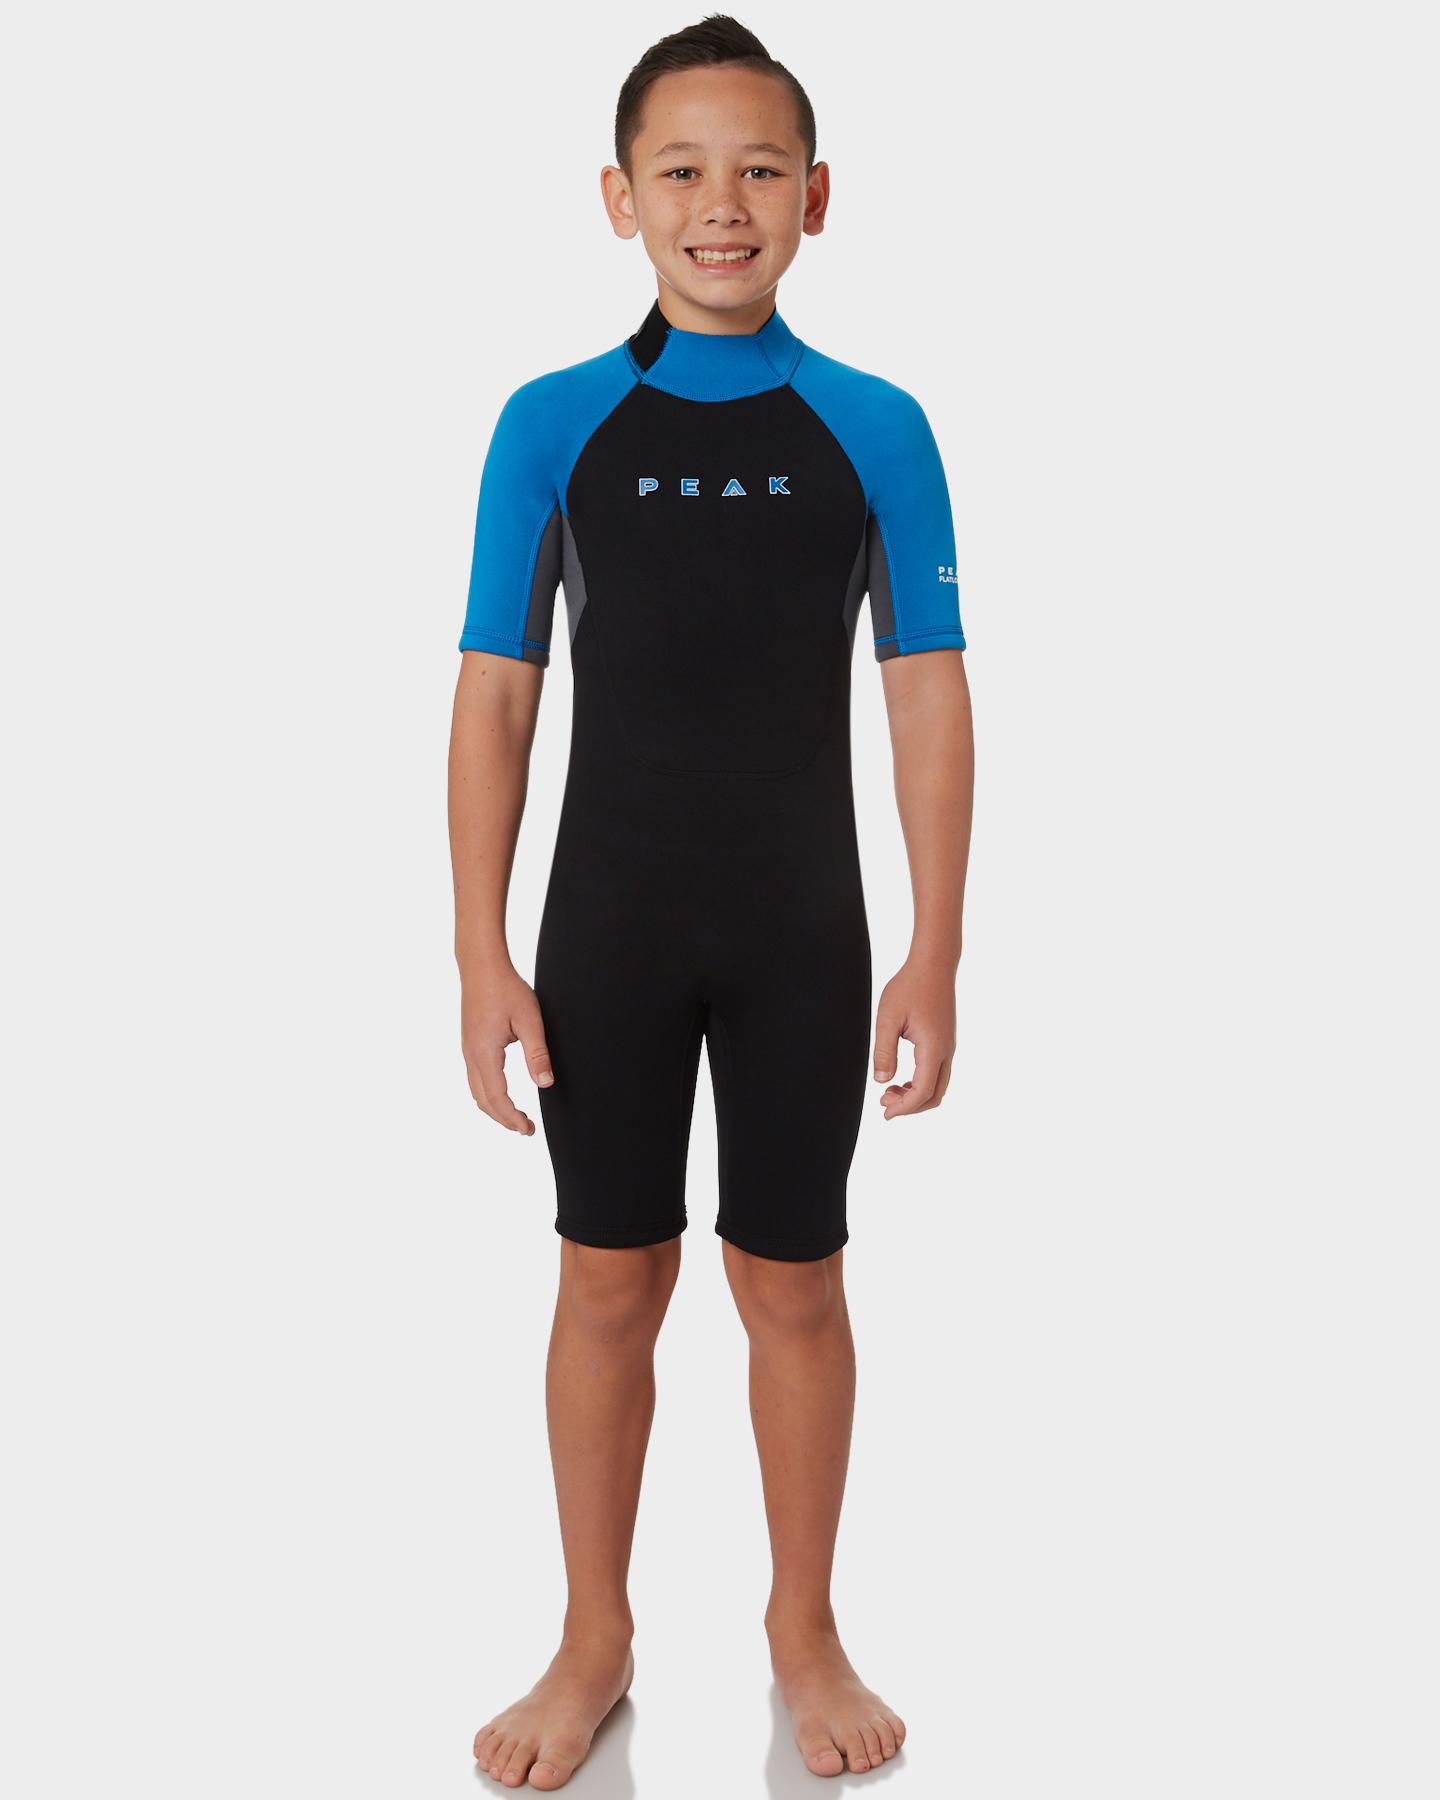 Peak Boys Energy Ss Spring Suit Black Blue